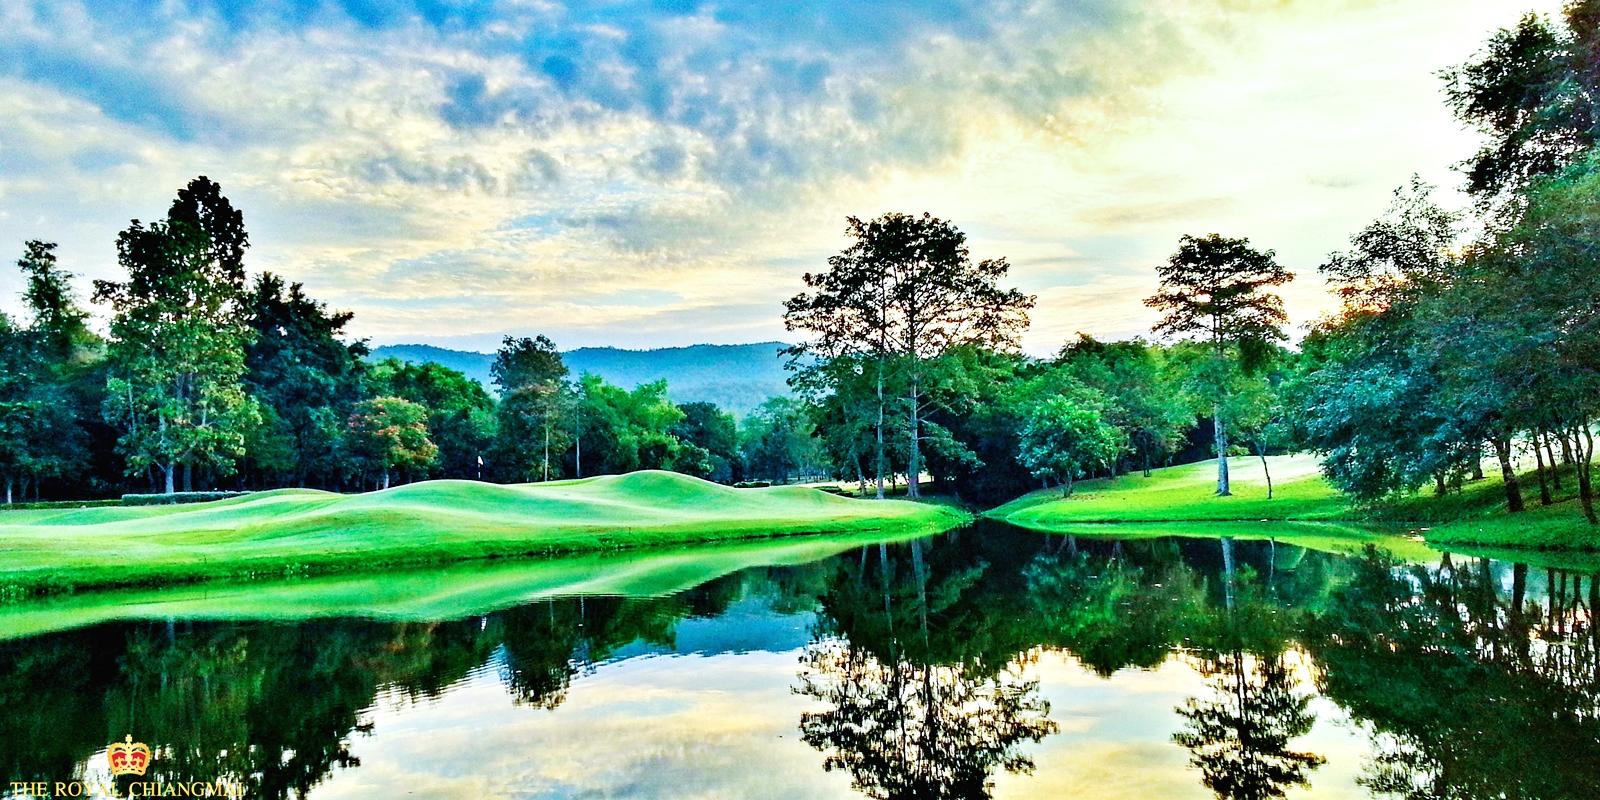 The Royal Chiangmai Golf Resort